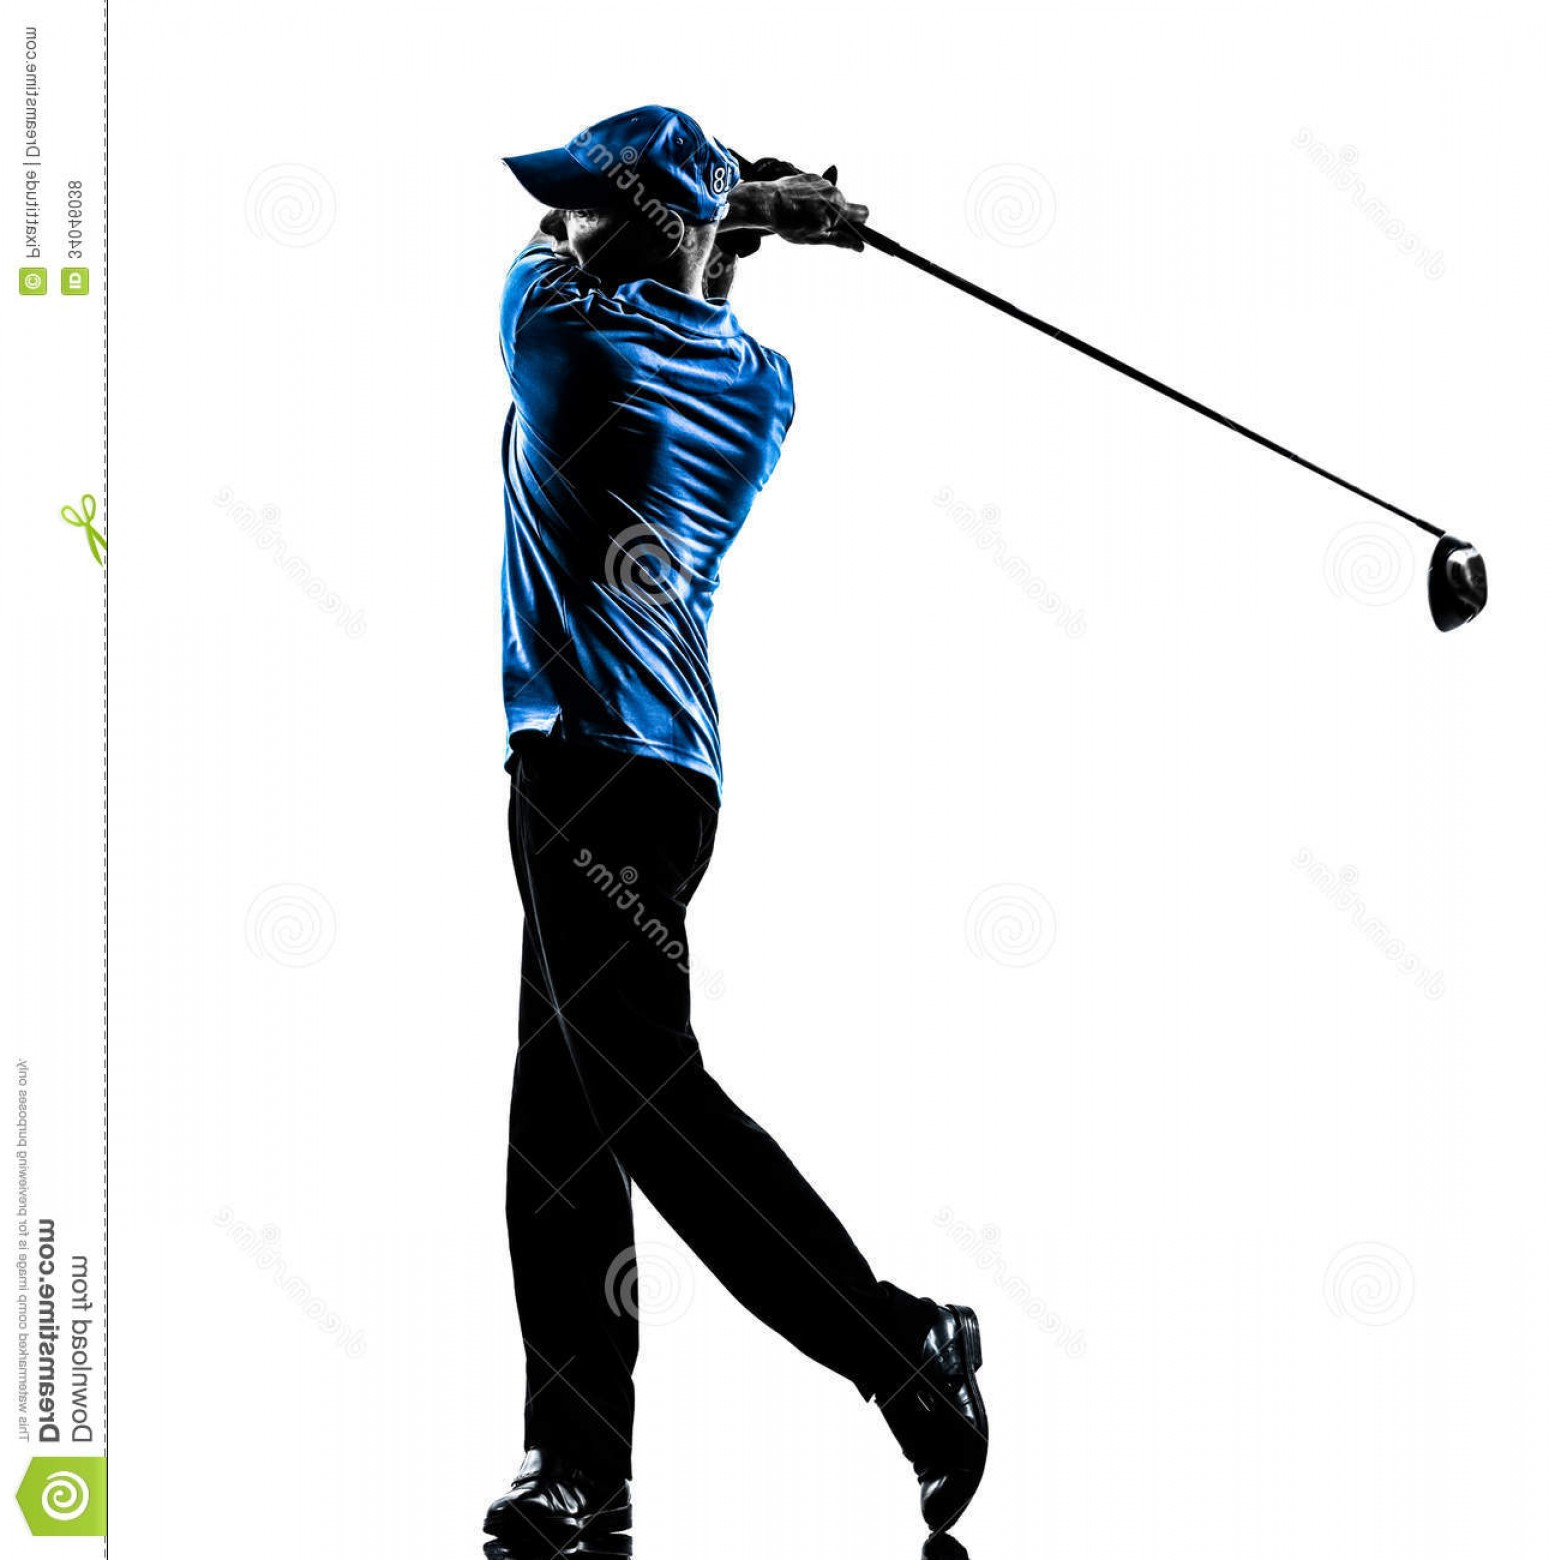 1549x1560 Royalty Free Stock Photos Man Golfer Golfing Golf Swing Silhouette